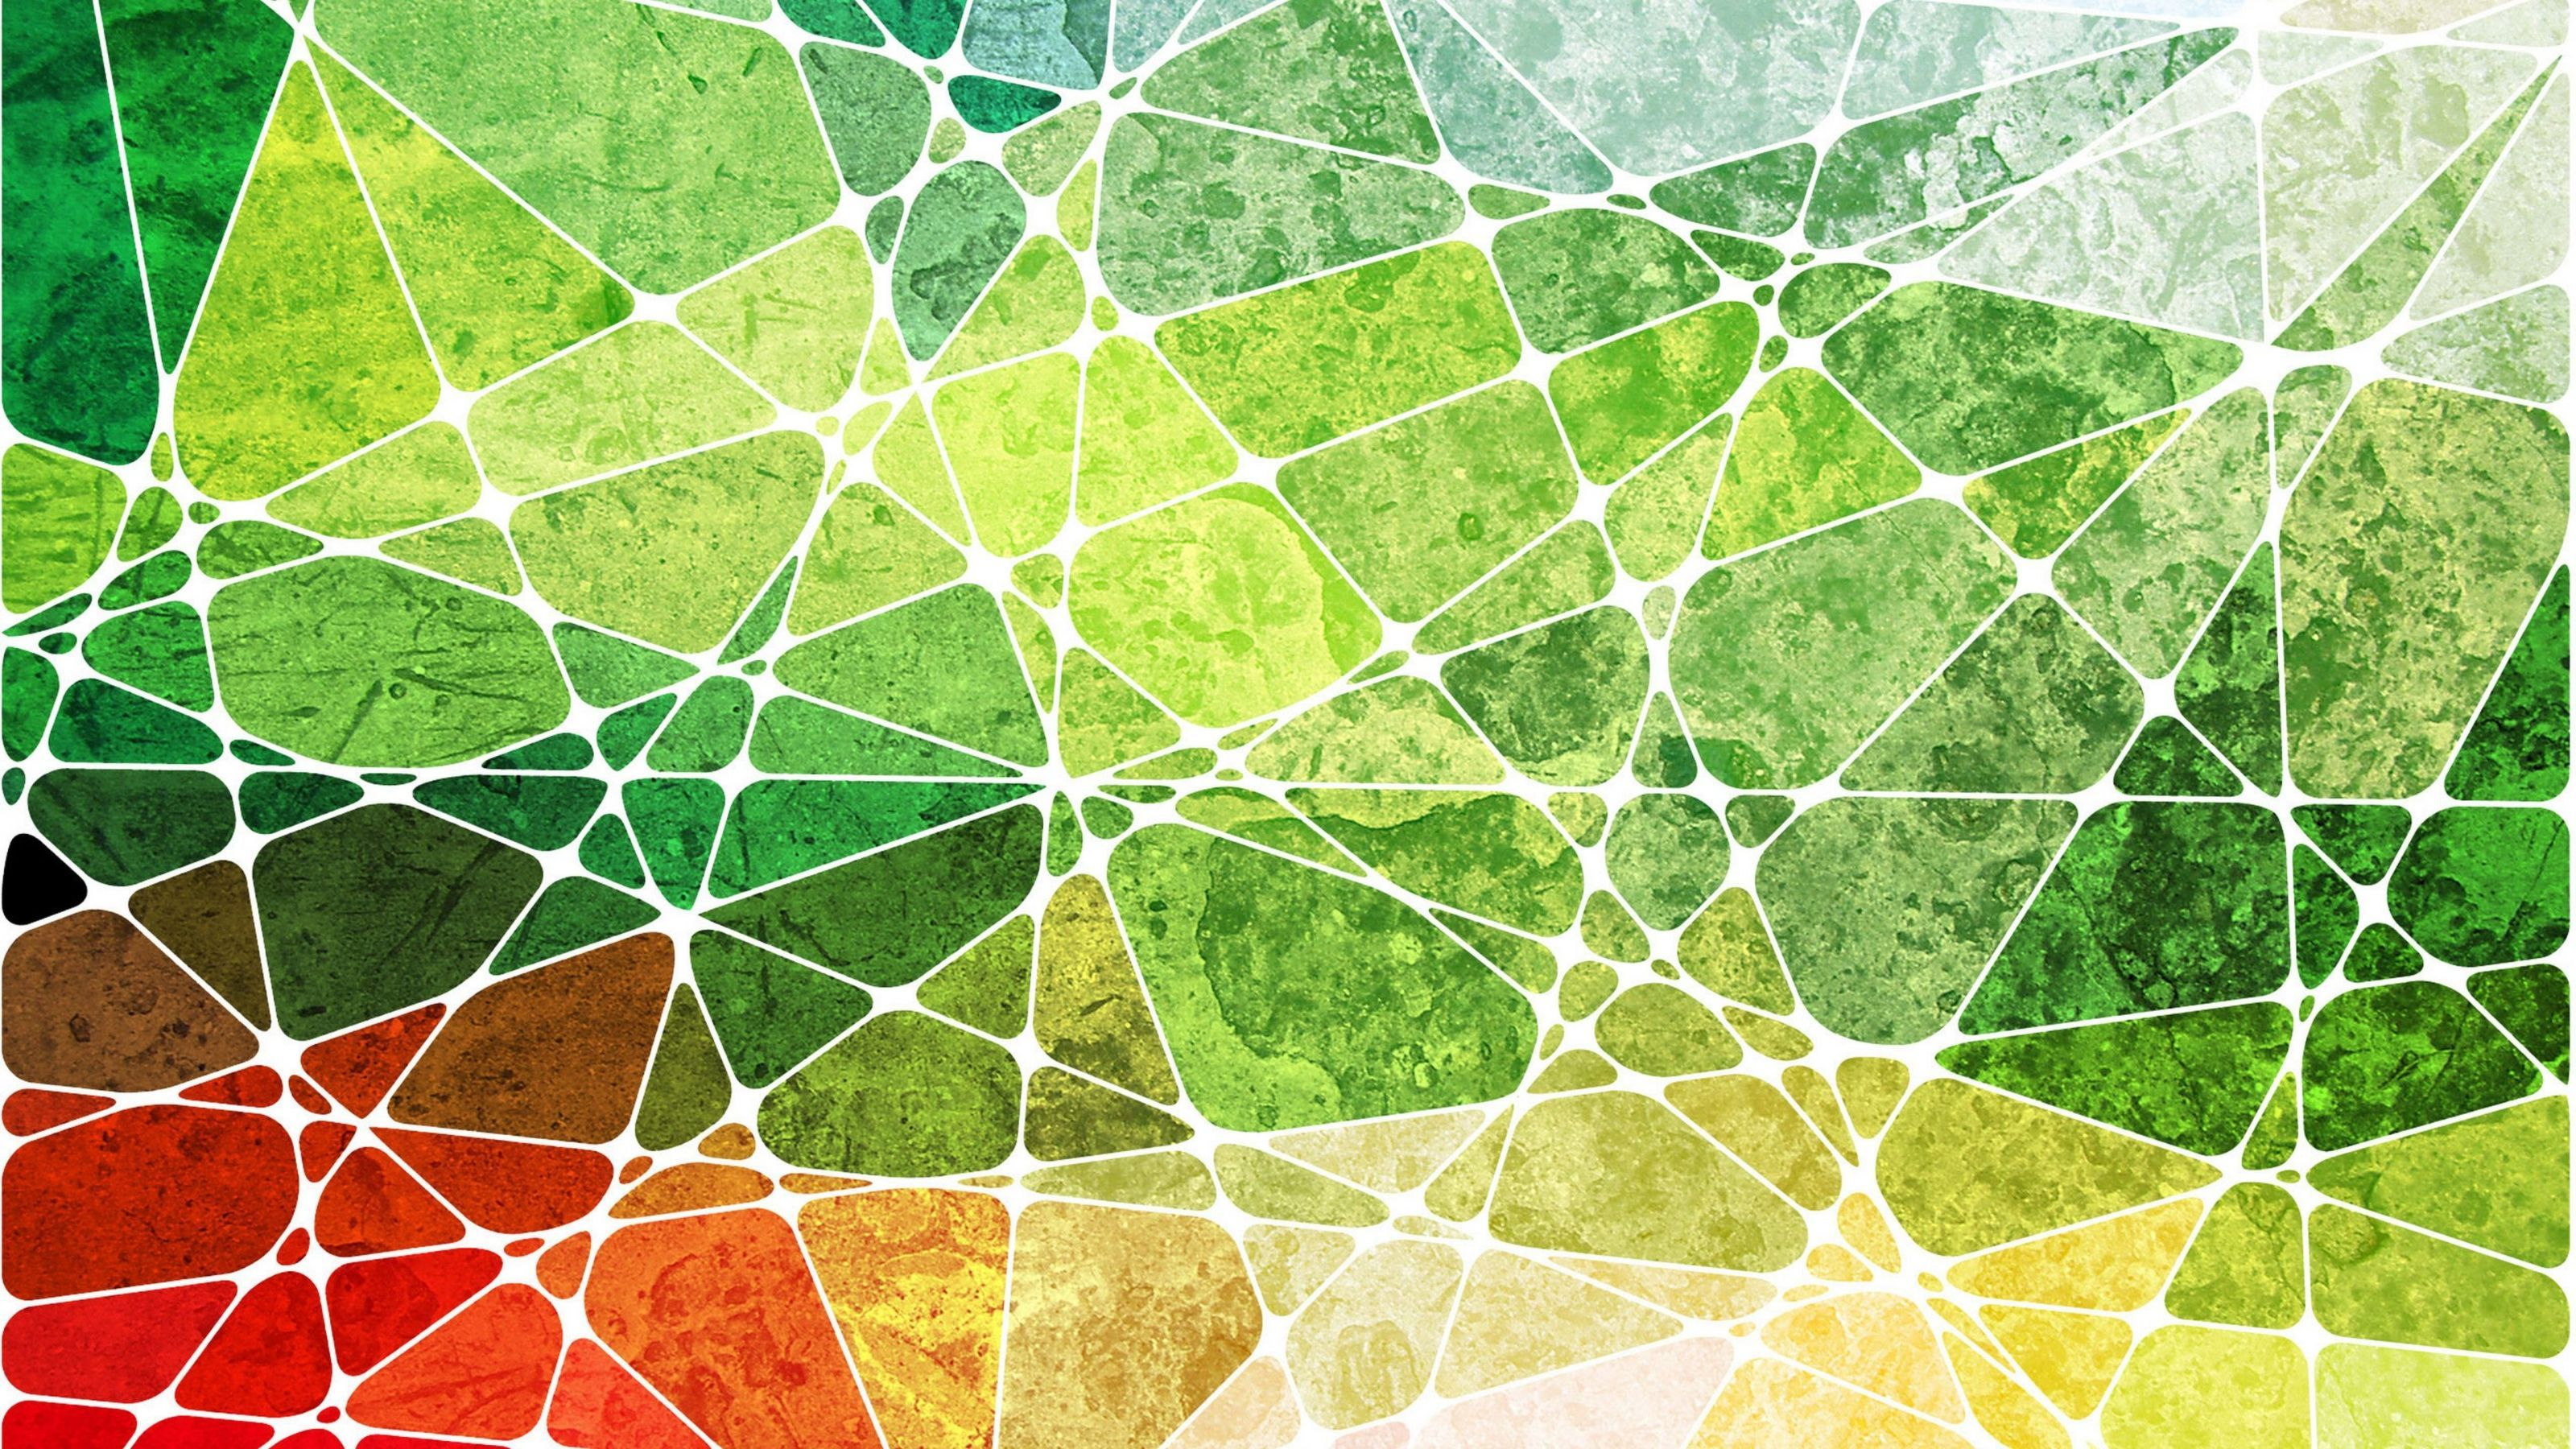 Geometric Ultra Hd Wallpaper Picture Image